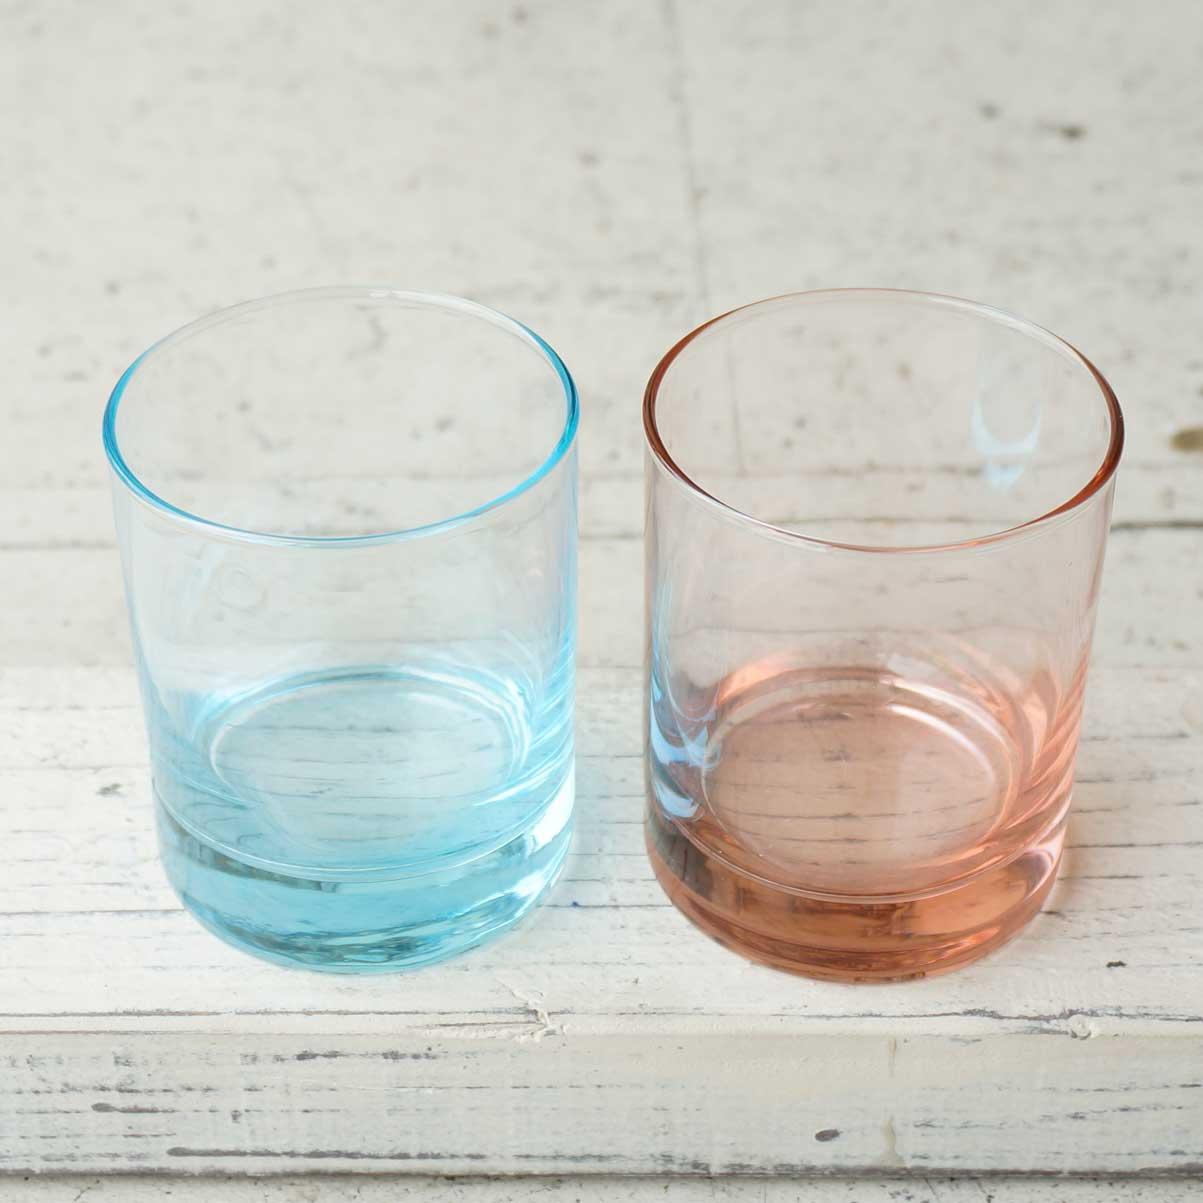 【SALE!!】アロマキャンドル用グラス ブルー (サークルL)【1個:3個:30個 フィルム別売り】